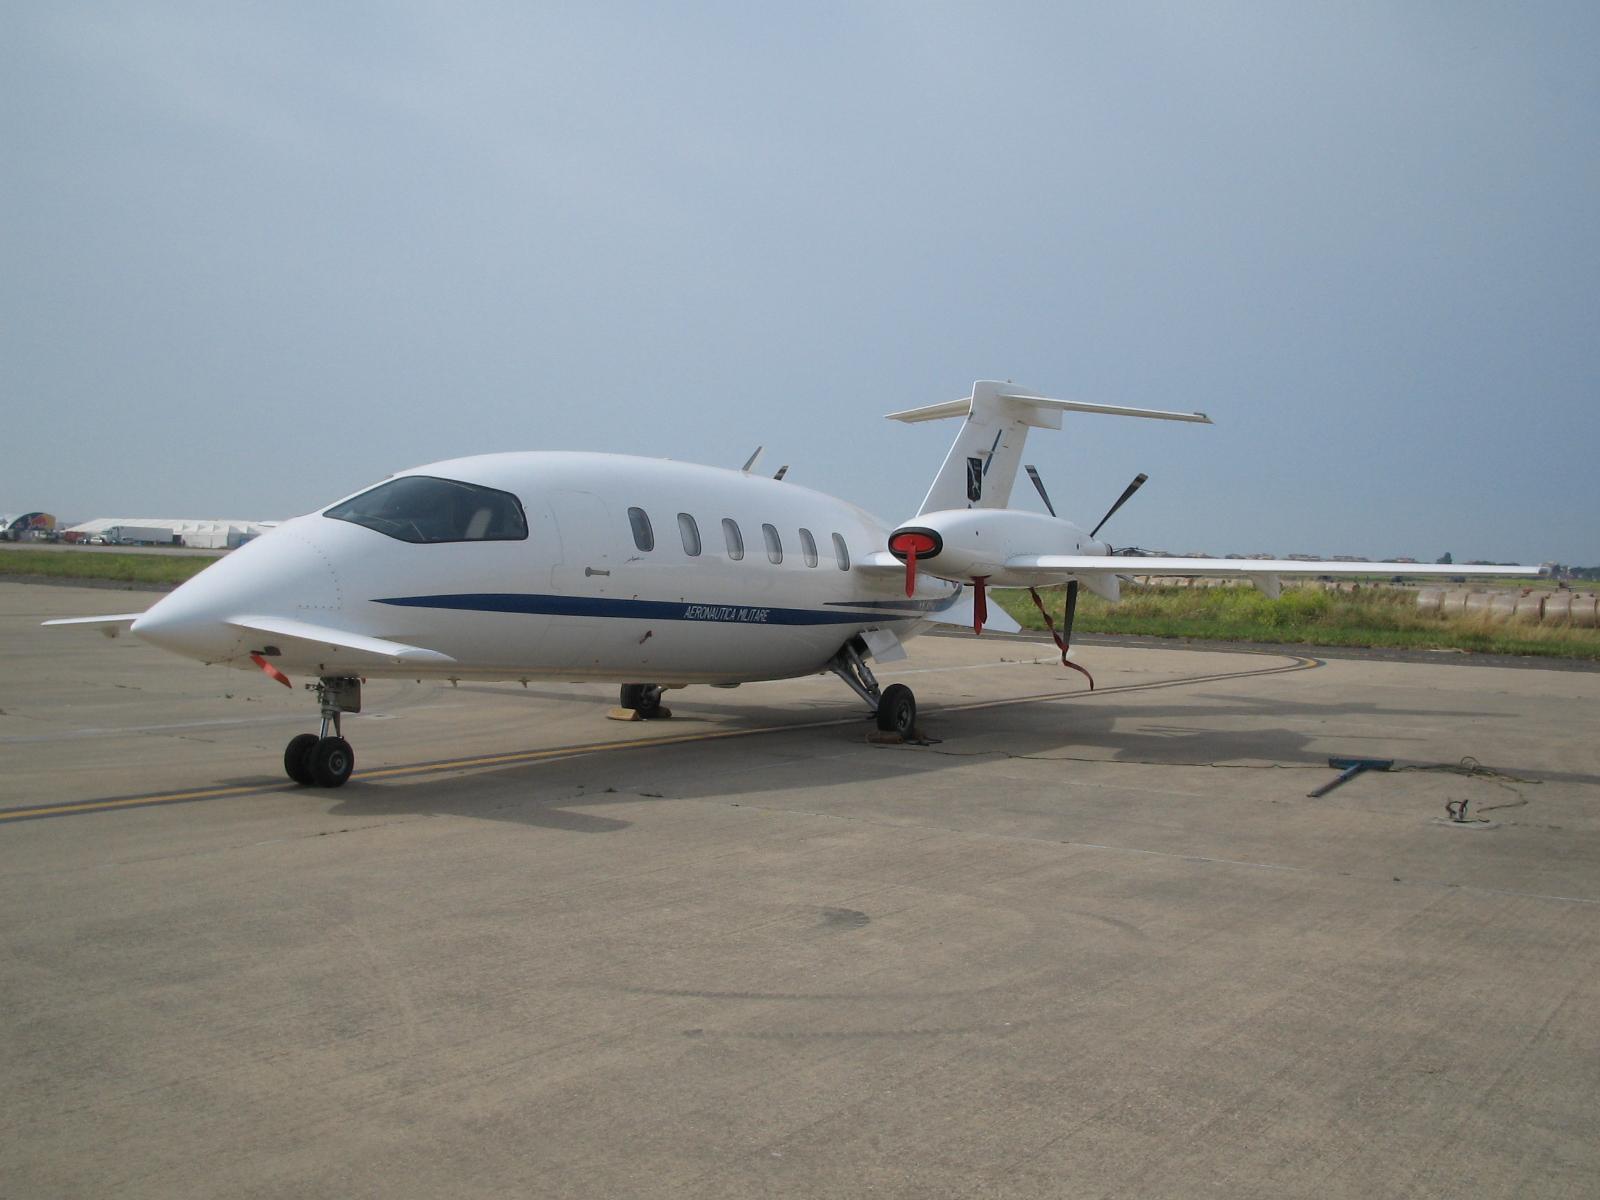 pesawat Turbo Prop Jet - Type Avanti P180.